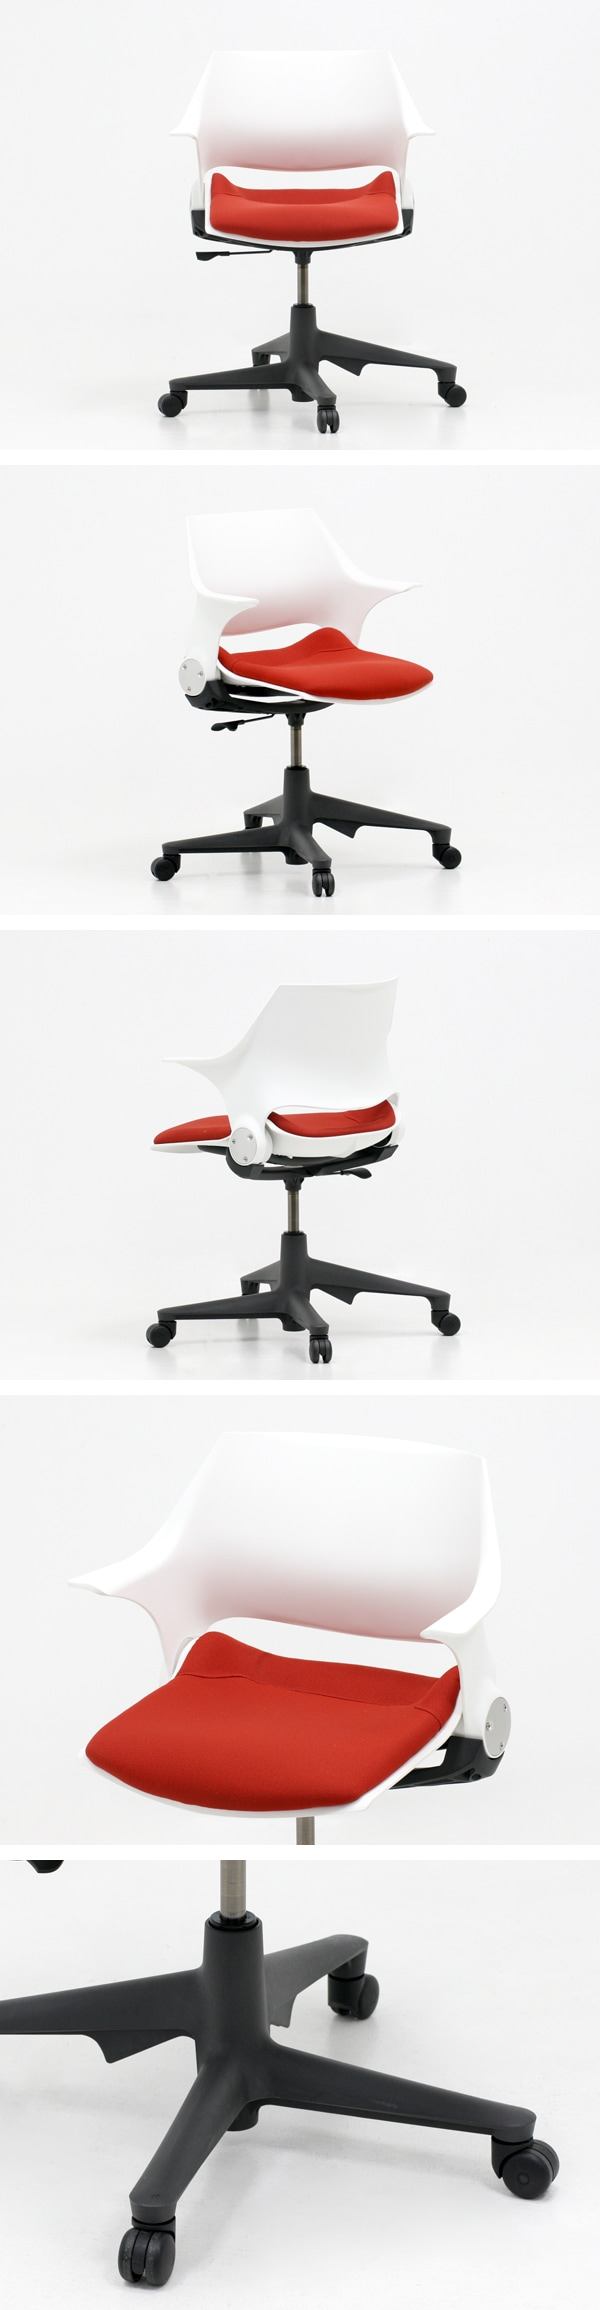 VECTA,ヴェクタ,Rocky 4 Star,ネスティングチェア,中古,椅子,オフィスチェア,デザイナーズ家具,アメリカ,おすすめ